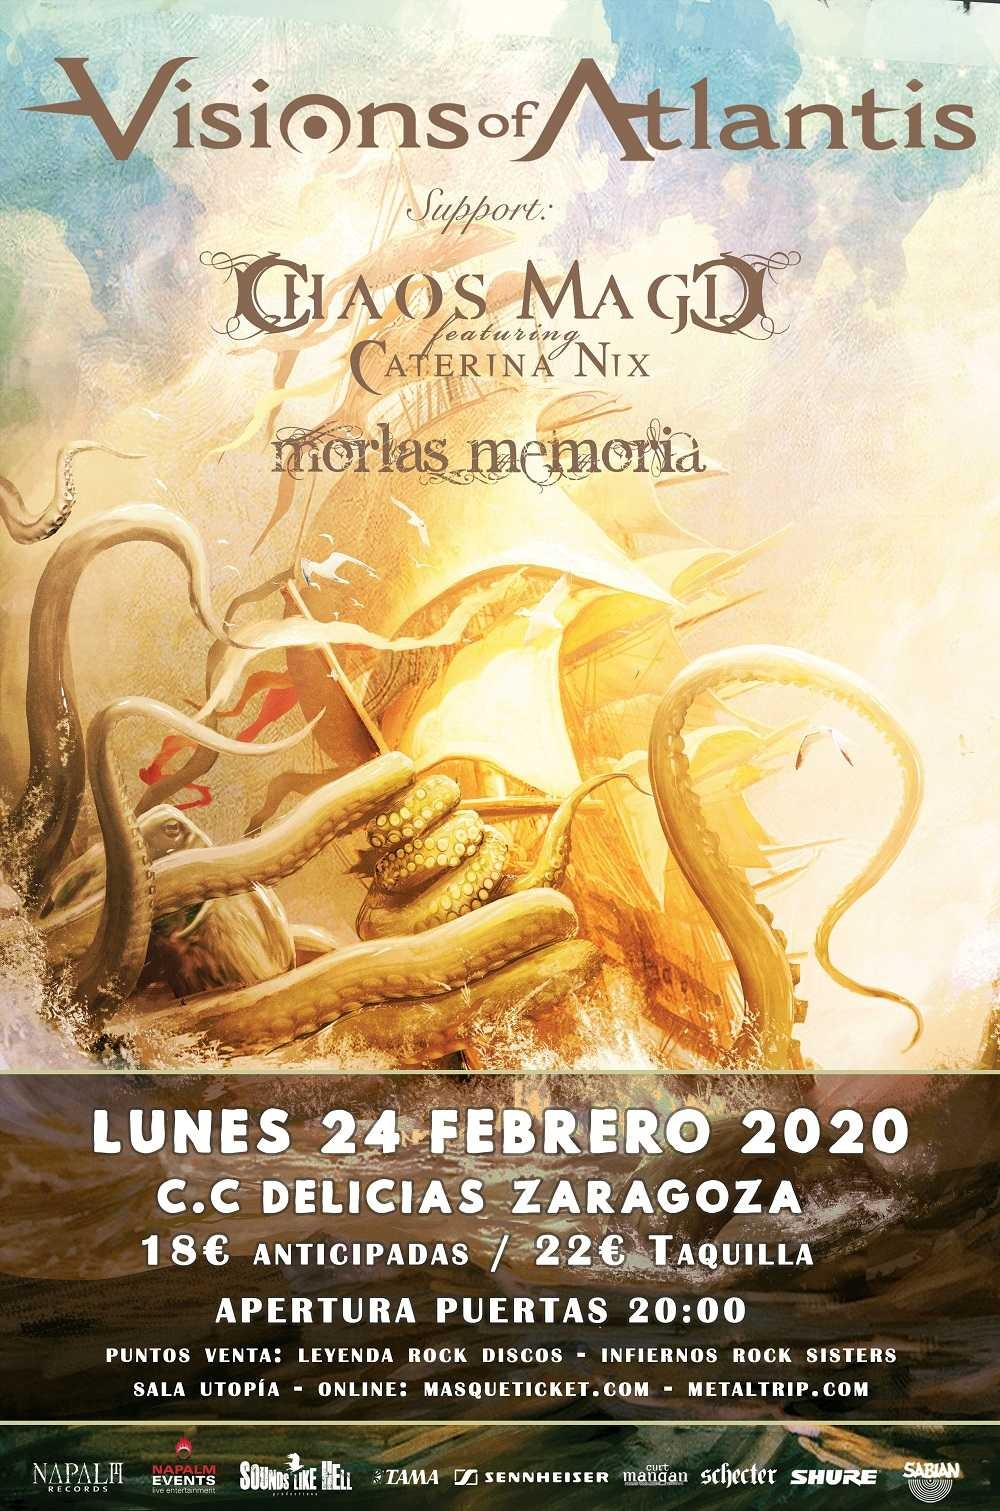 VISIONS OF ATLANTIS + CHAOS MAGIC + MORLAS MEMORIA  (Zaragoza)